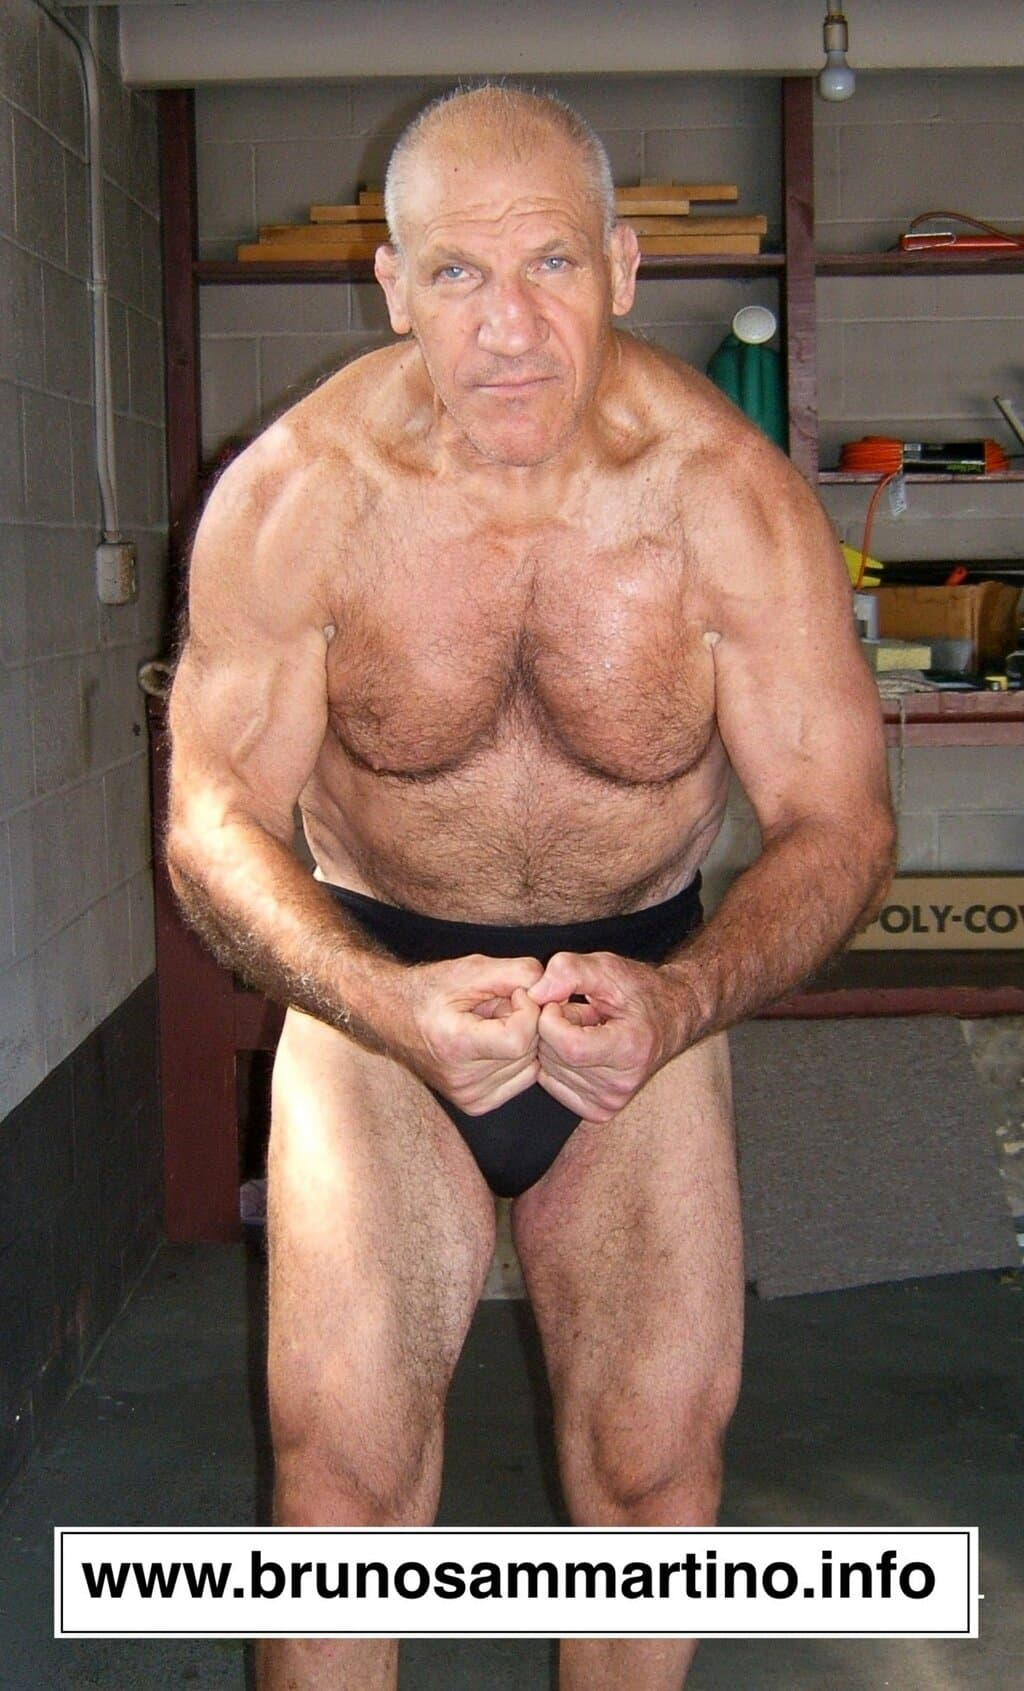 Bruno Sammartino (77 años - 2013) / BrunoSammartino.info